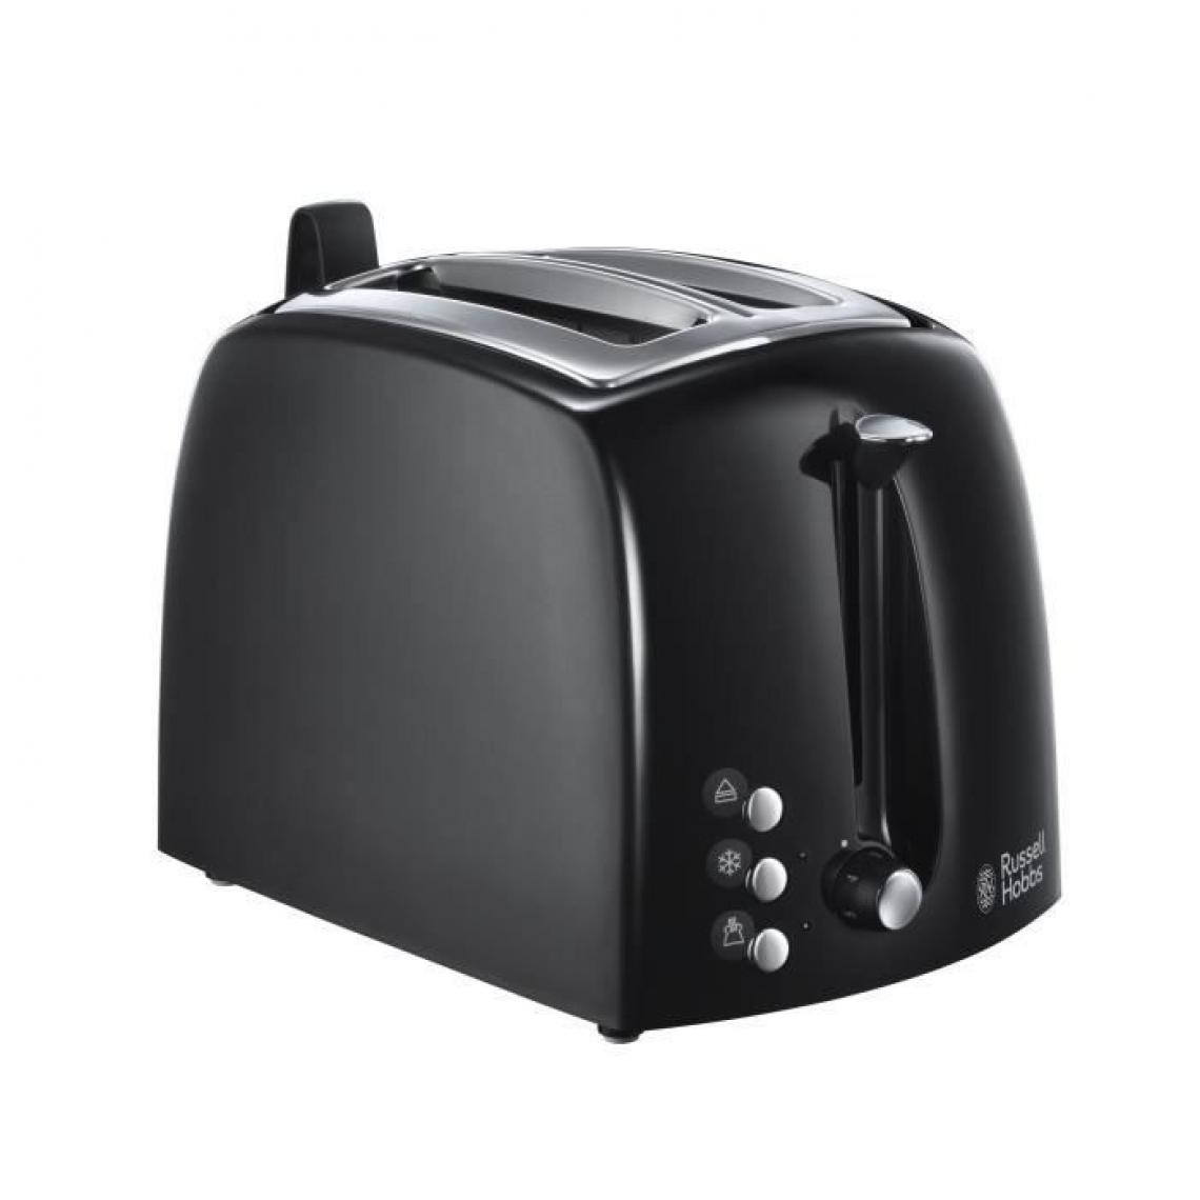 Russell Hobbs RUSSELL HOBBS 22601-56 - Toaster Textures Plus - 895 W - Noir